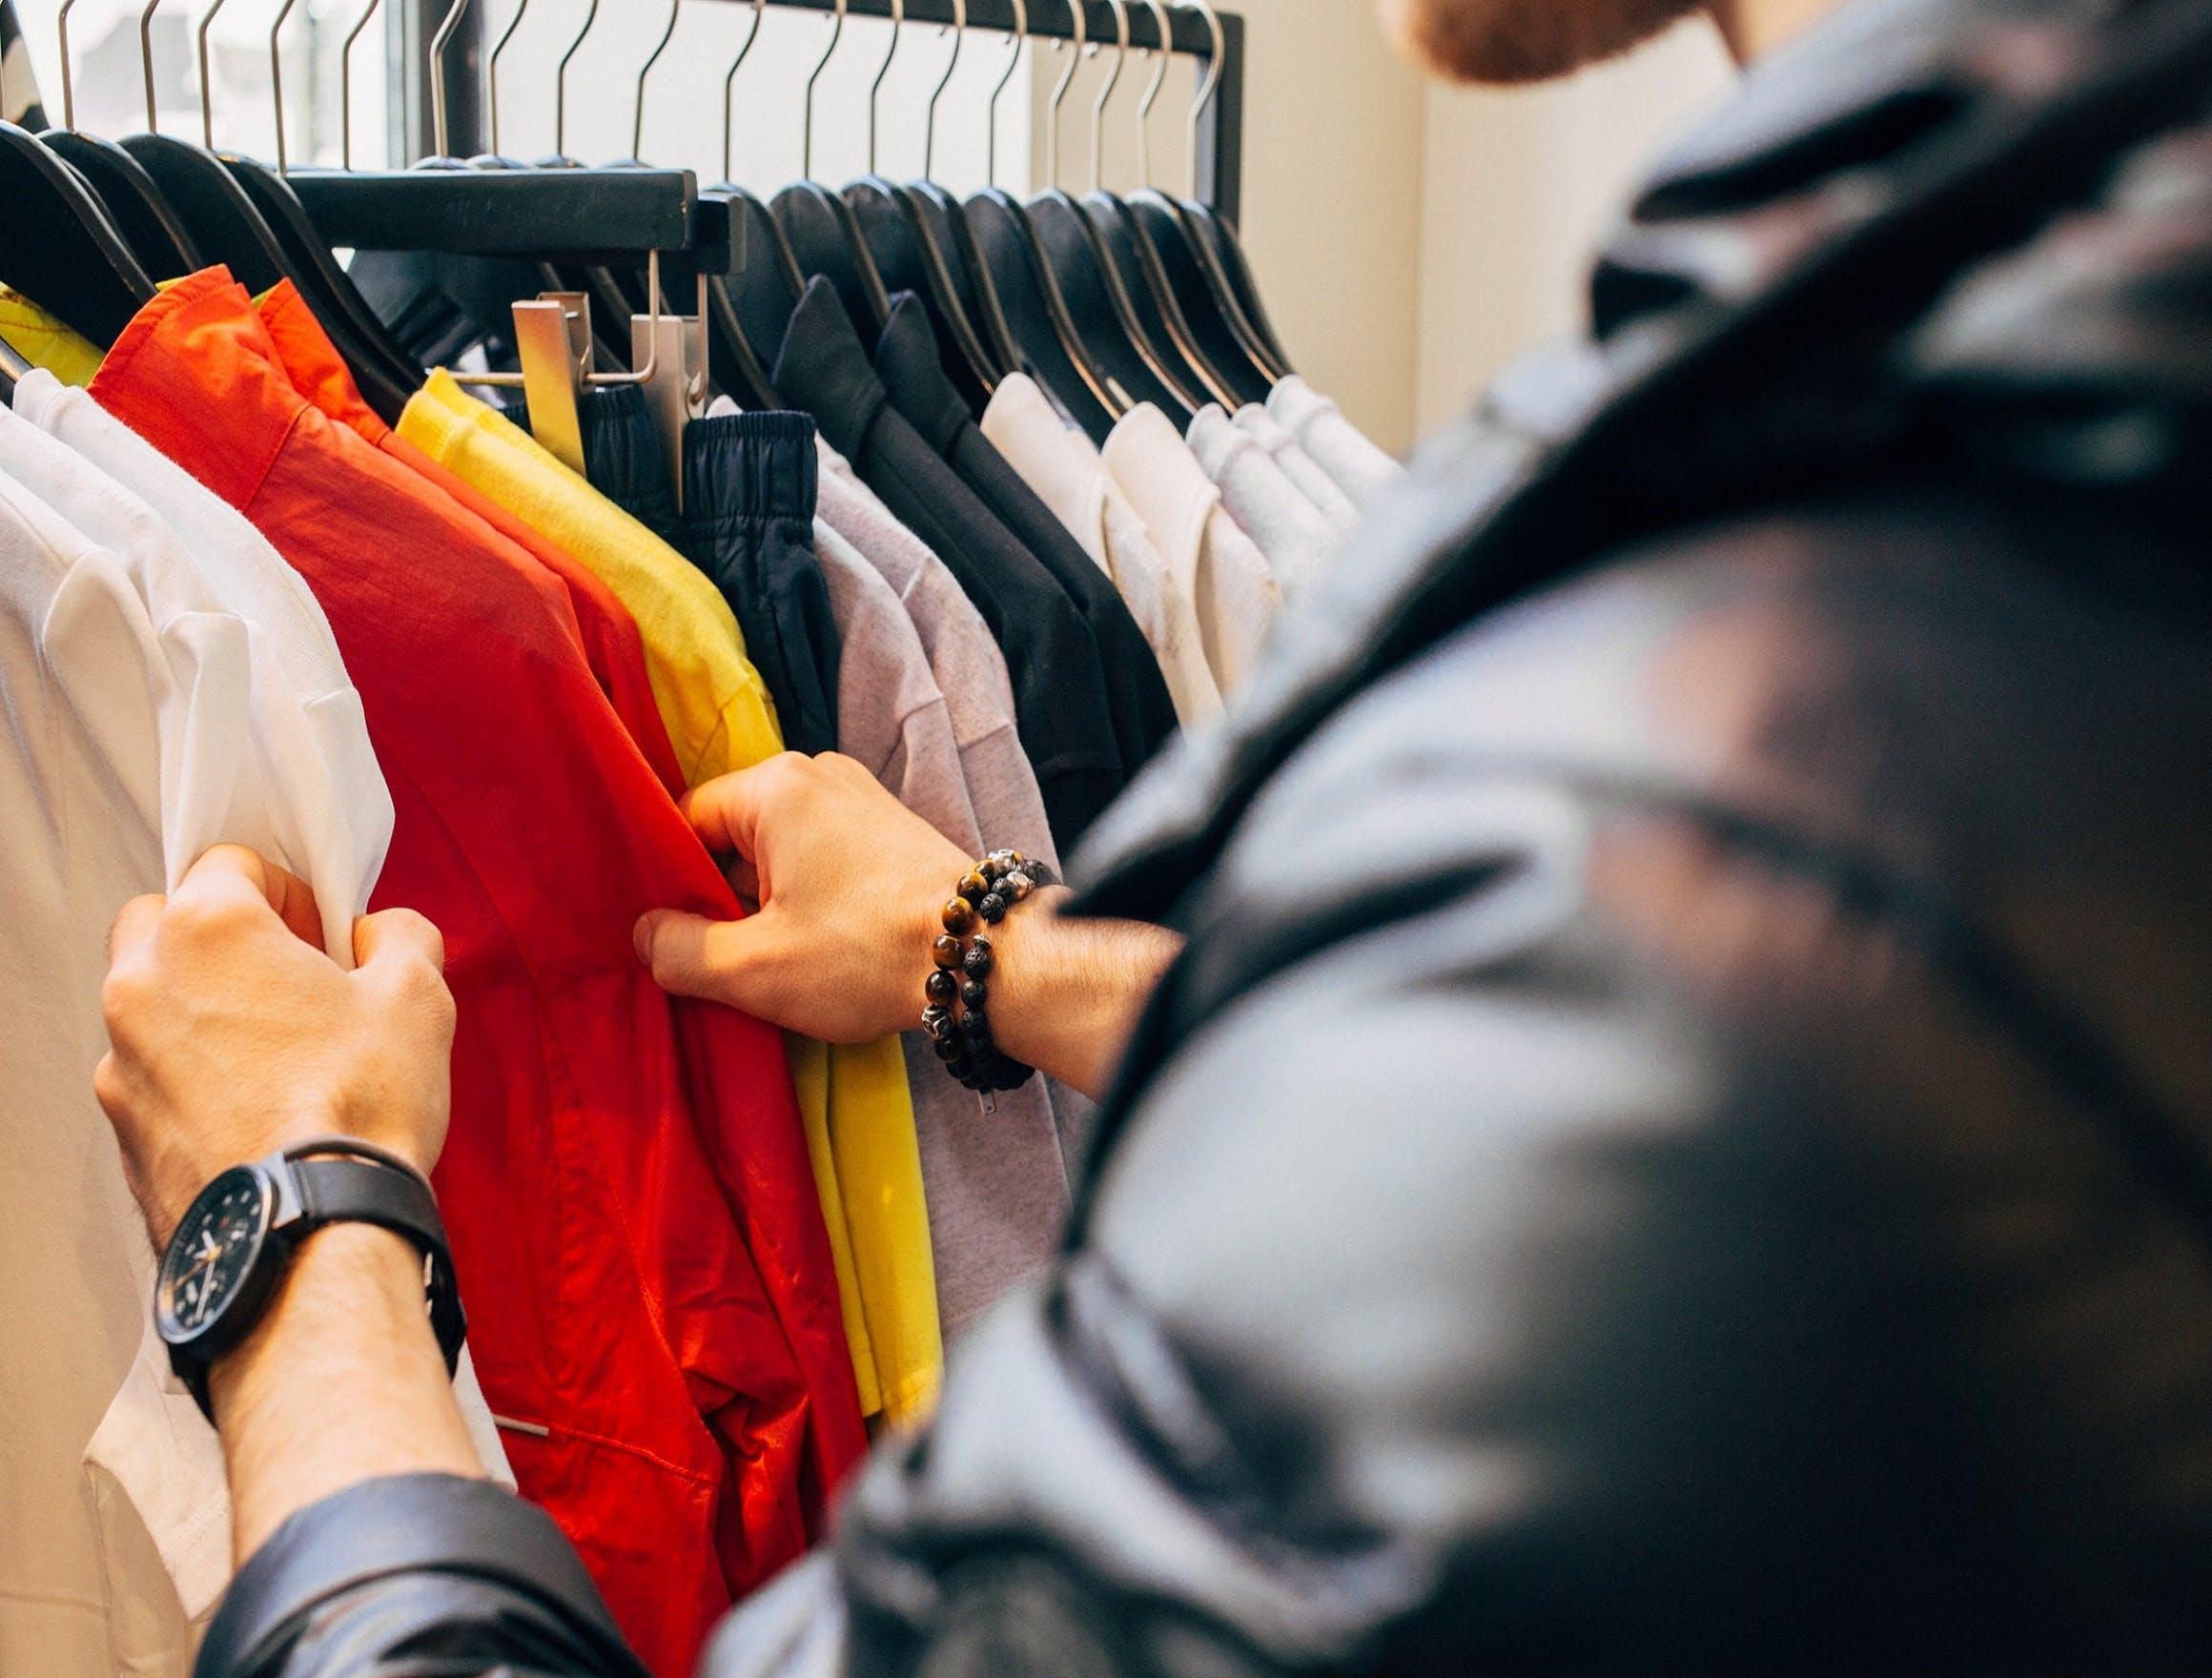 Millennials present a tremendous opportunity as shoppers